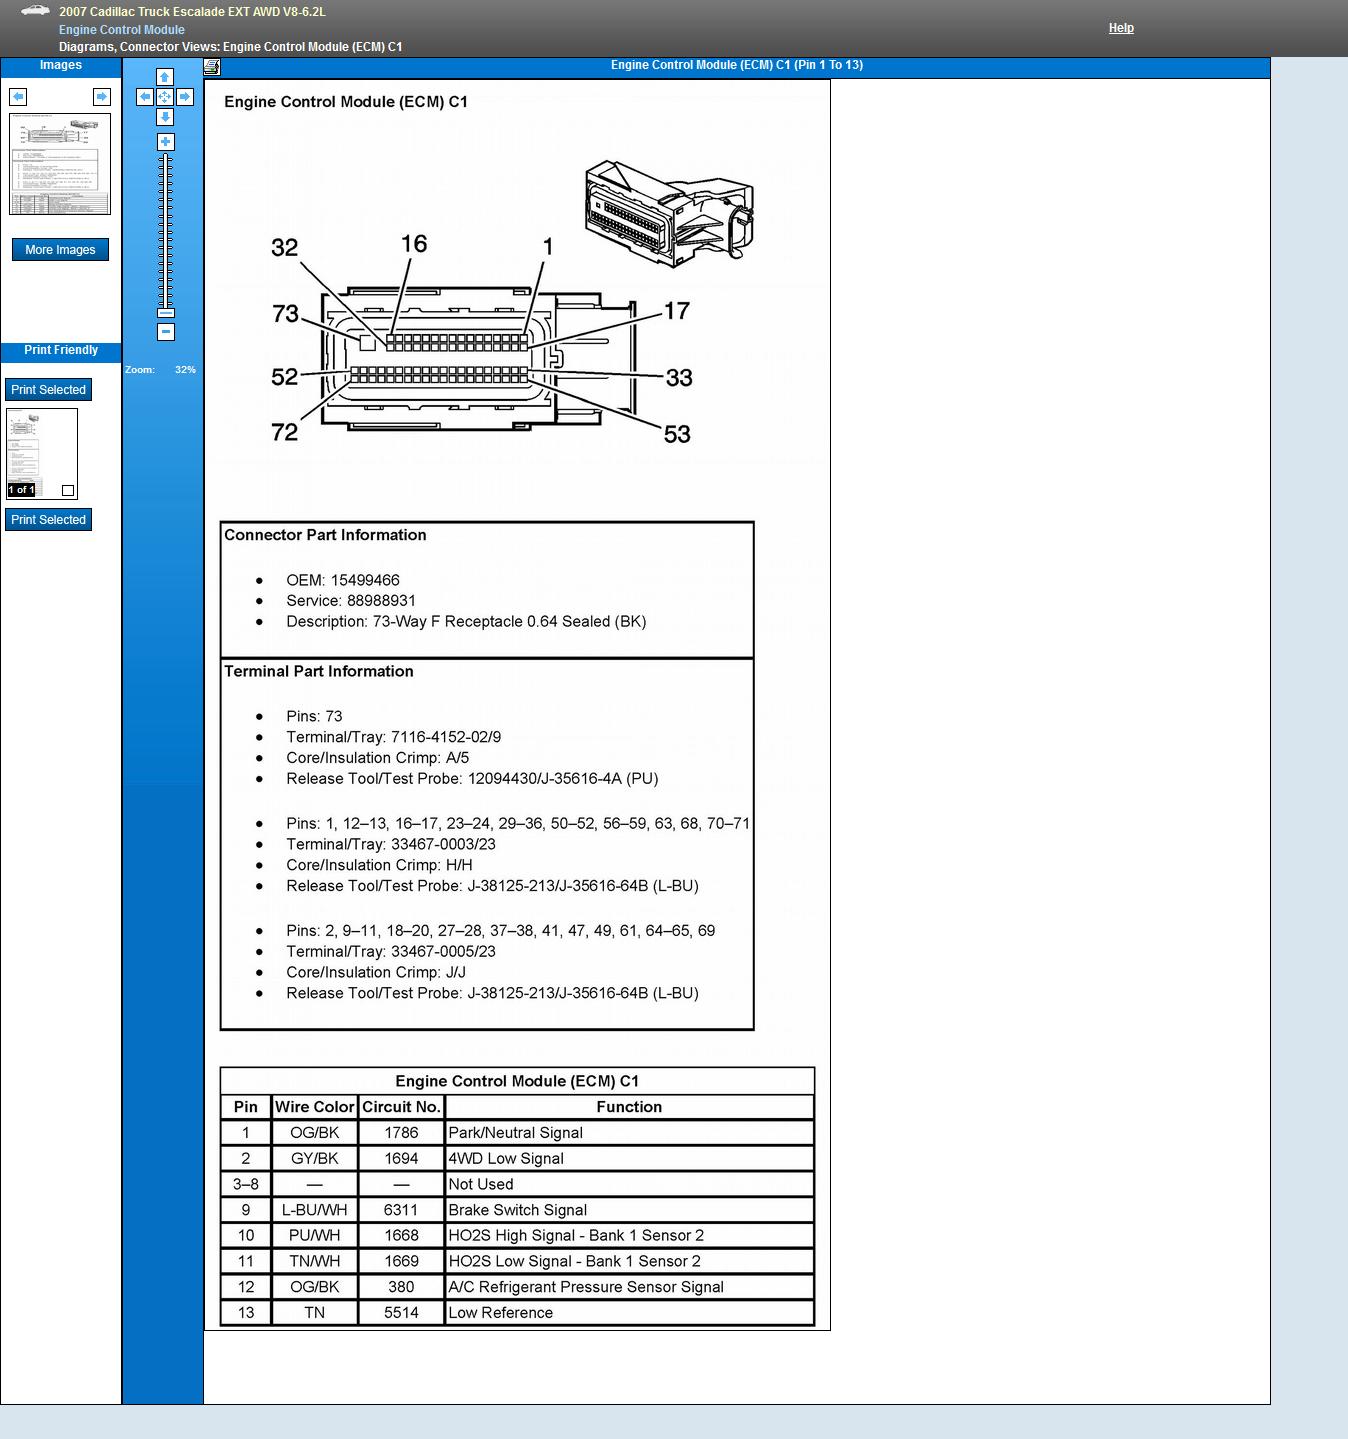 Cadillac Bcm Stabilitrak Wiring Diagram - Wiring Diagrams Schema